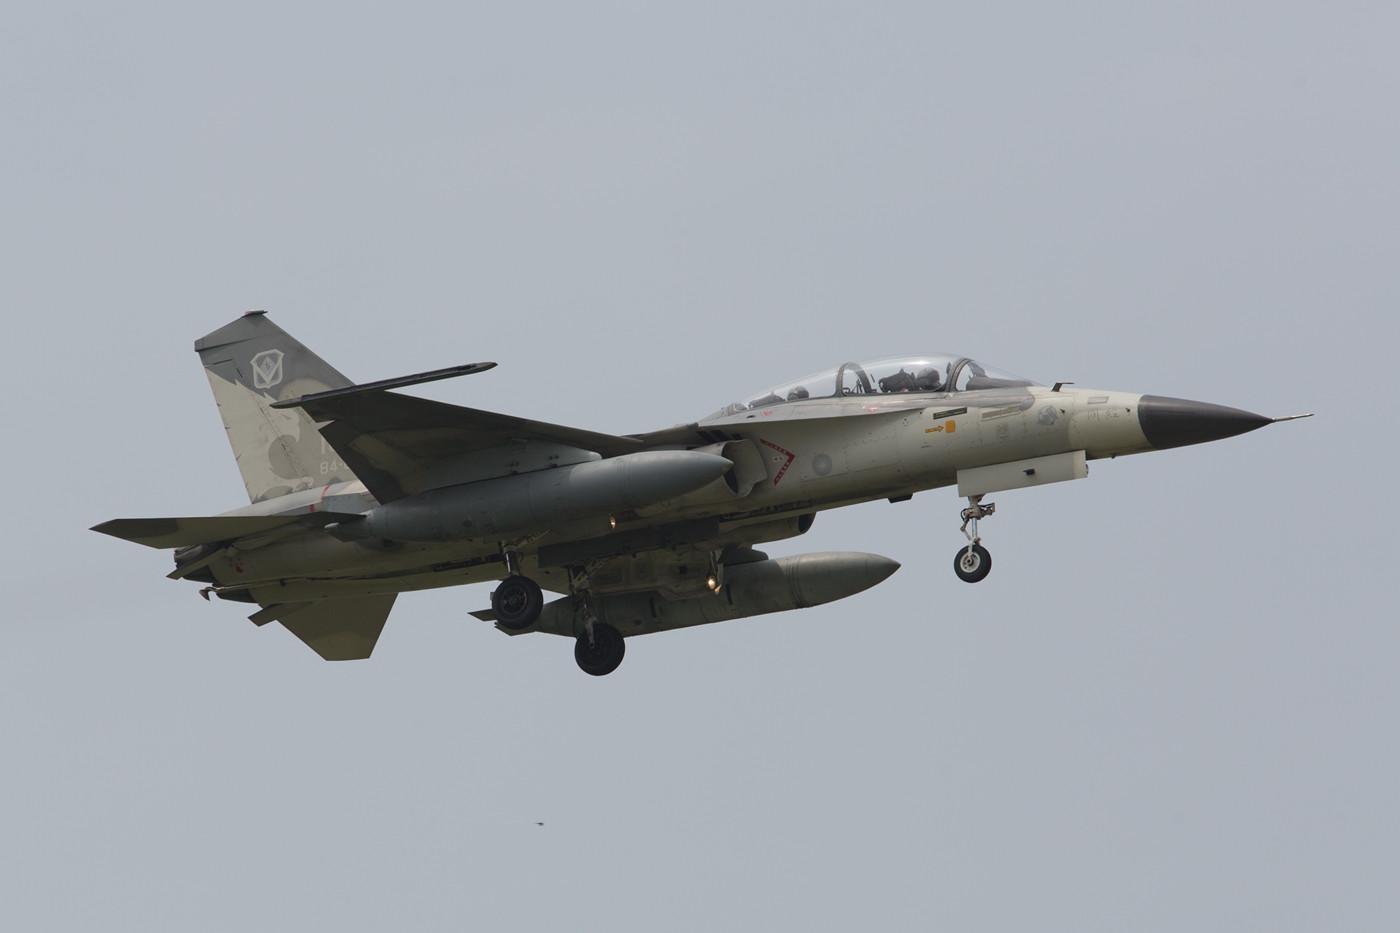 F-CK-1B der 1st TFW am Morgen.